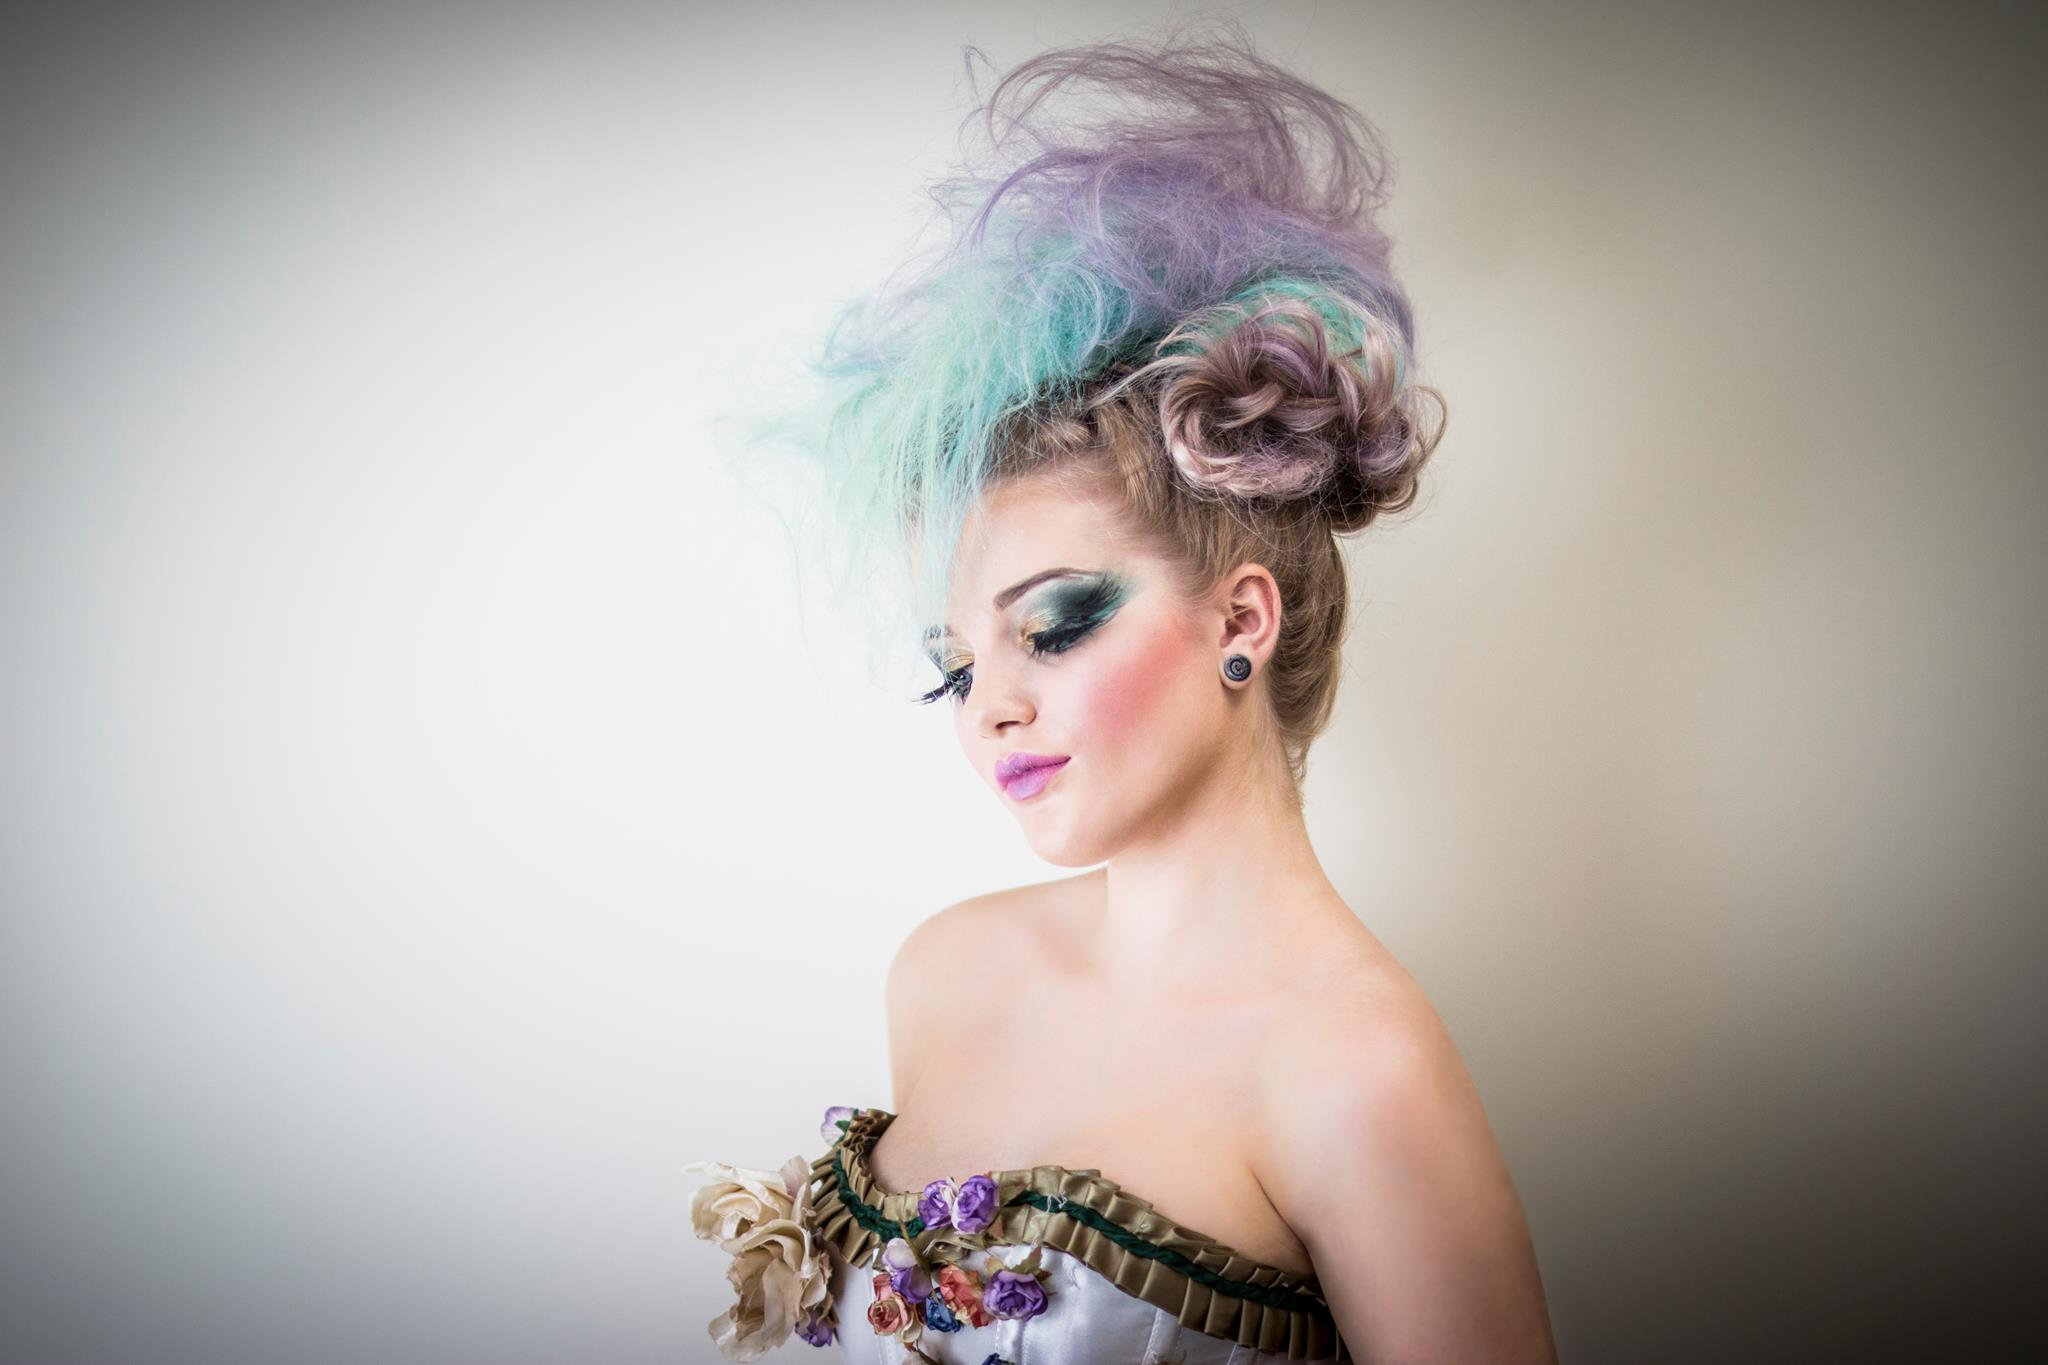 Pili_pala_shelley_pengilly_Jessica_verity_shelleys_salon_Bridgend_Aberkenfig_Hairdressers_Hair_Stylists